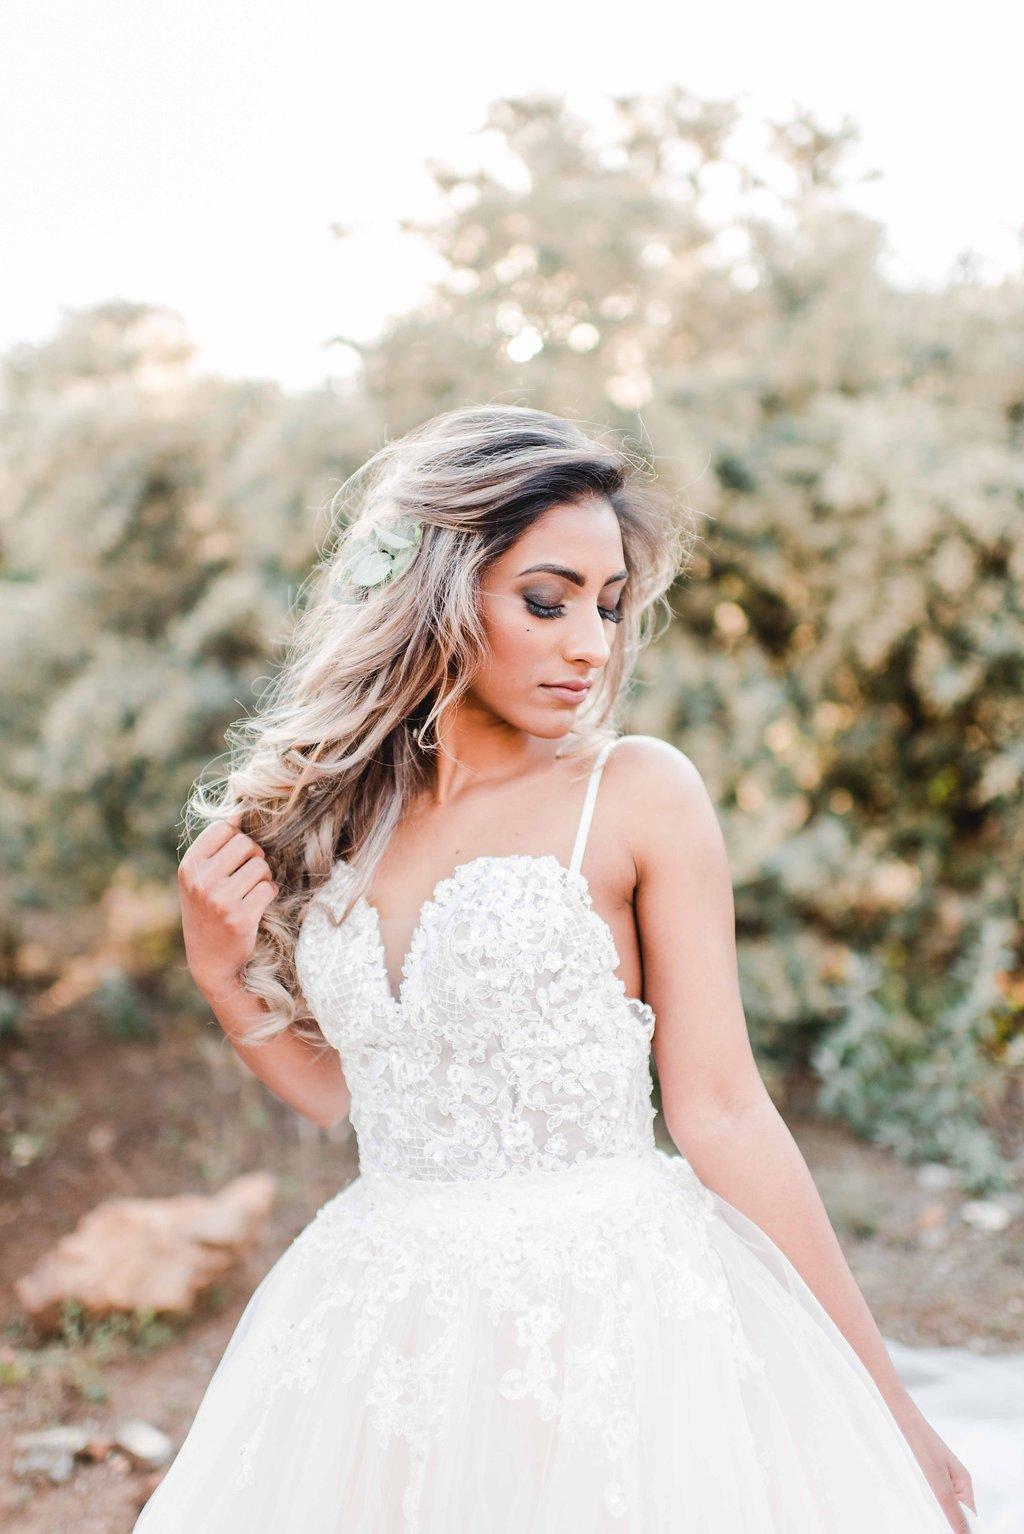 Glamorous Bride | Image: Carla Adel